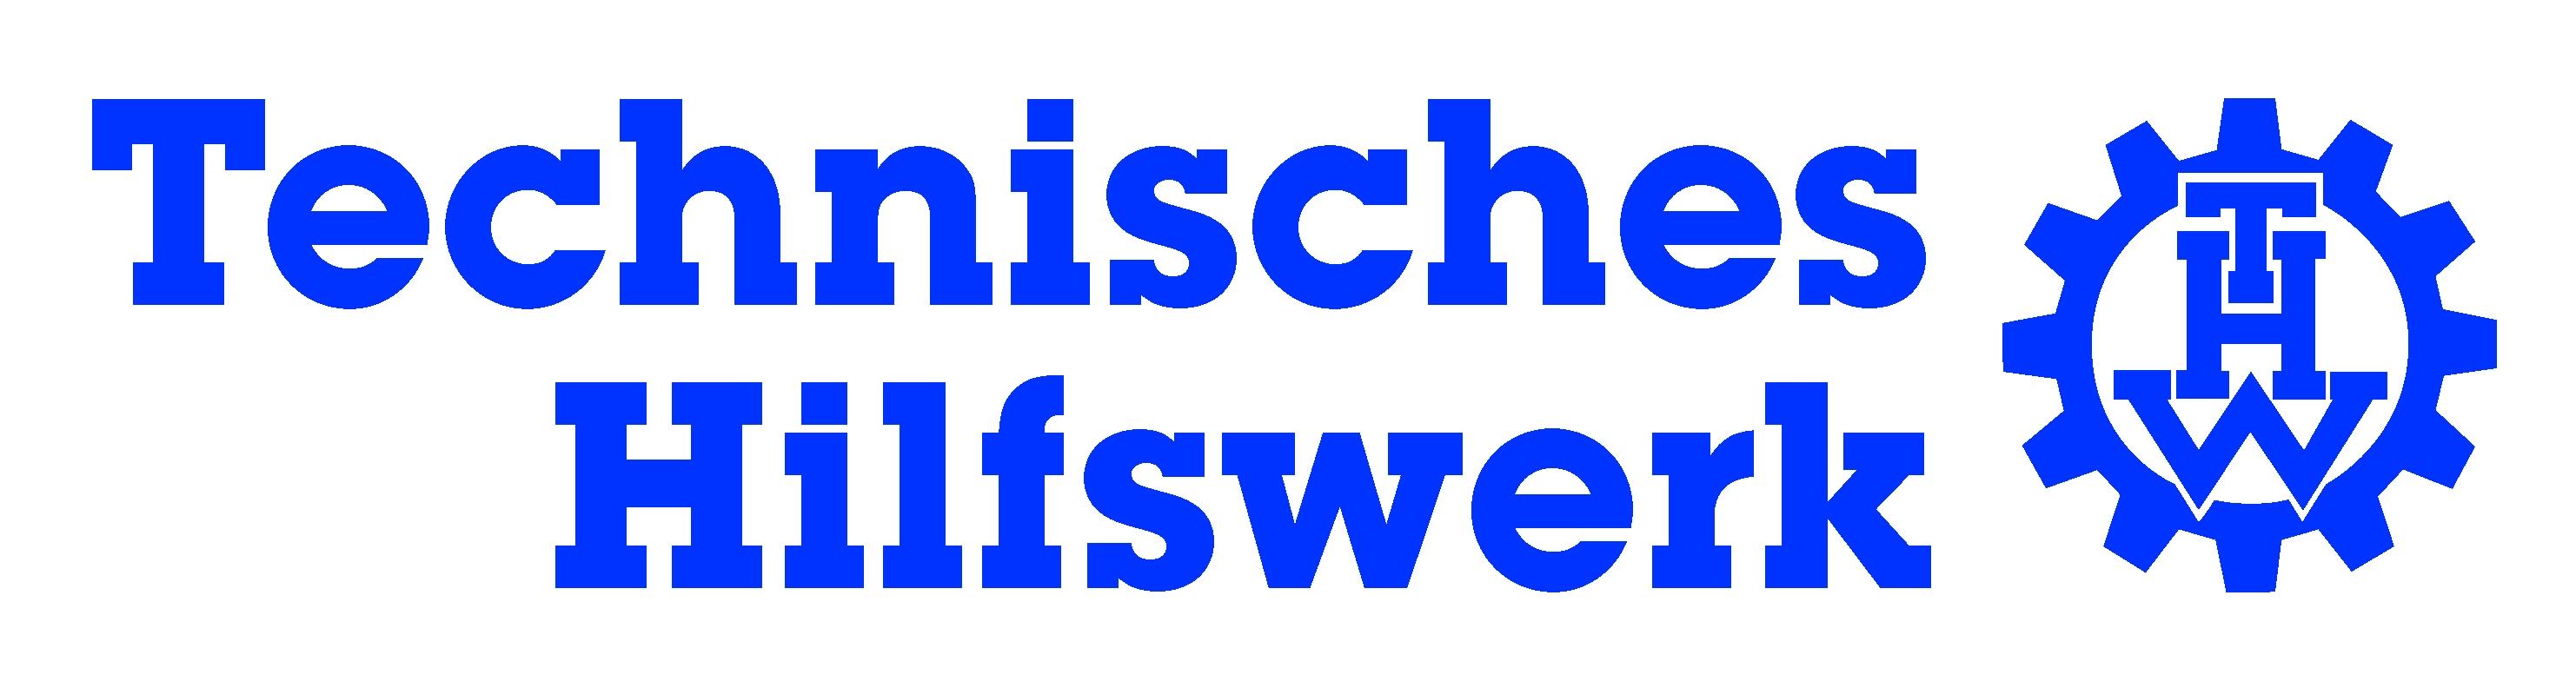 Logo_THW_4c.jpg